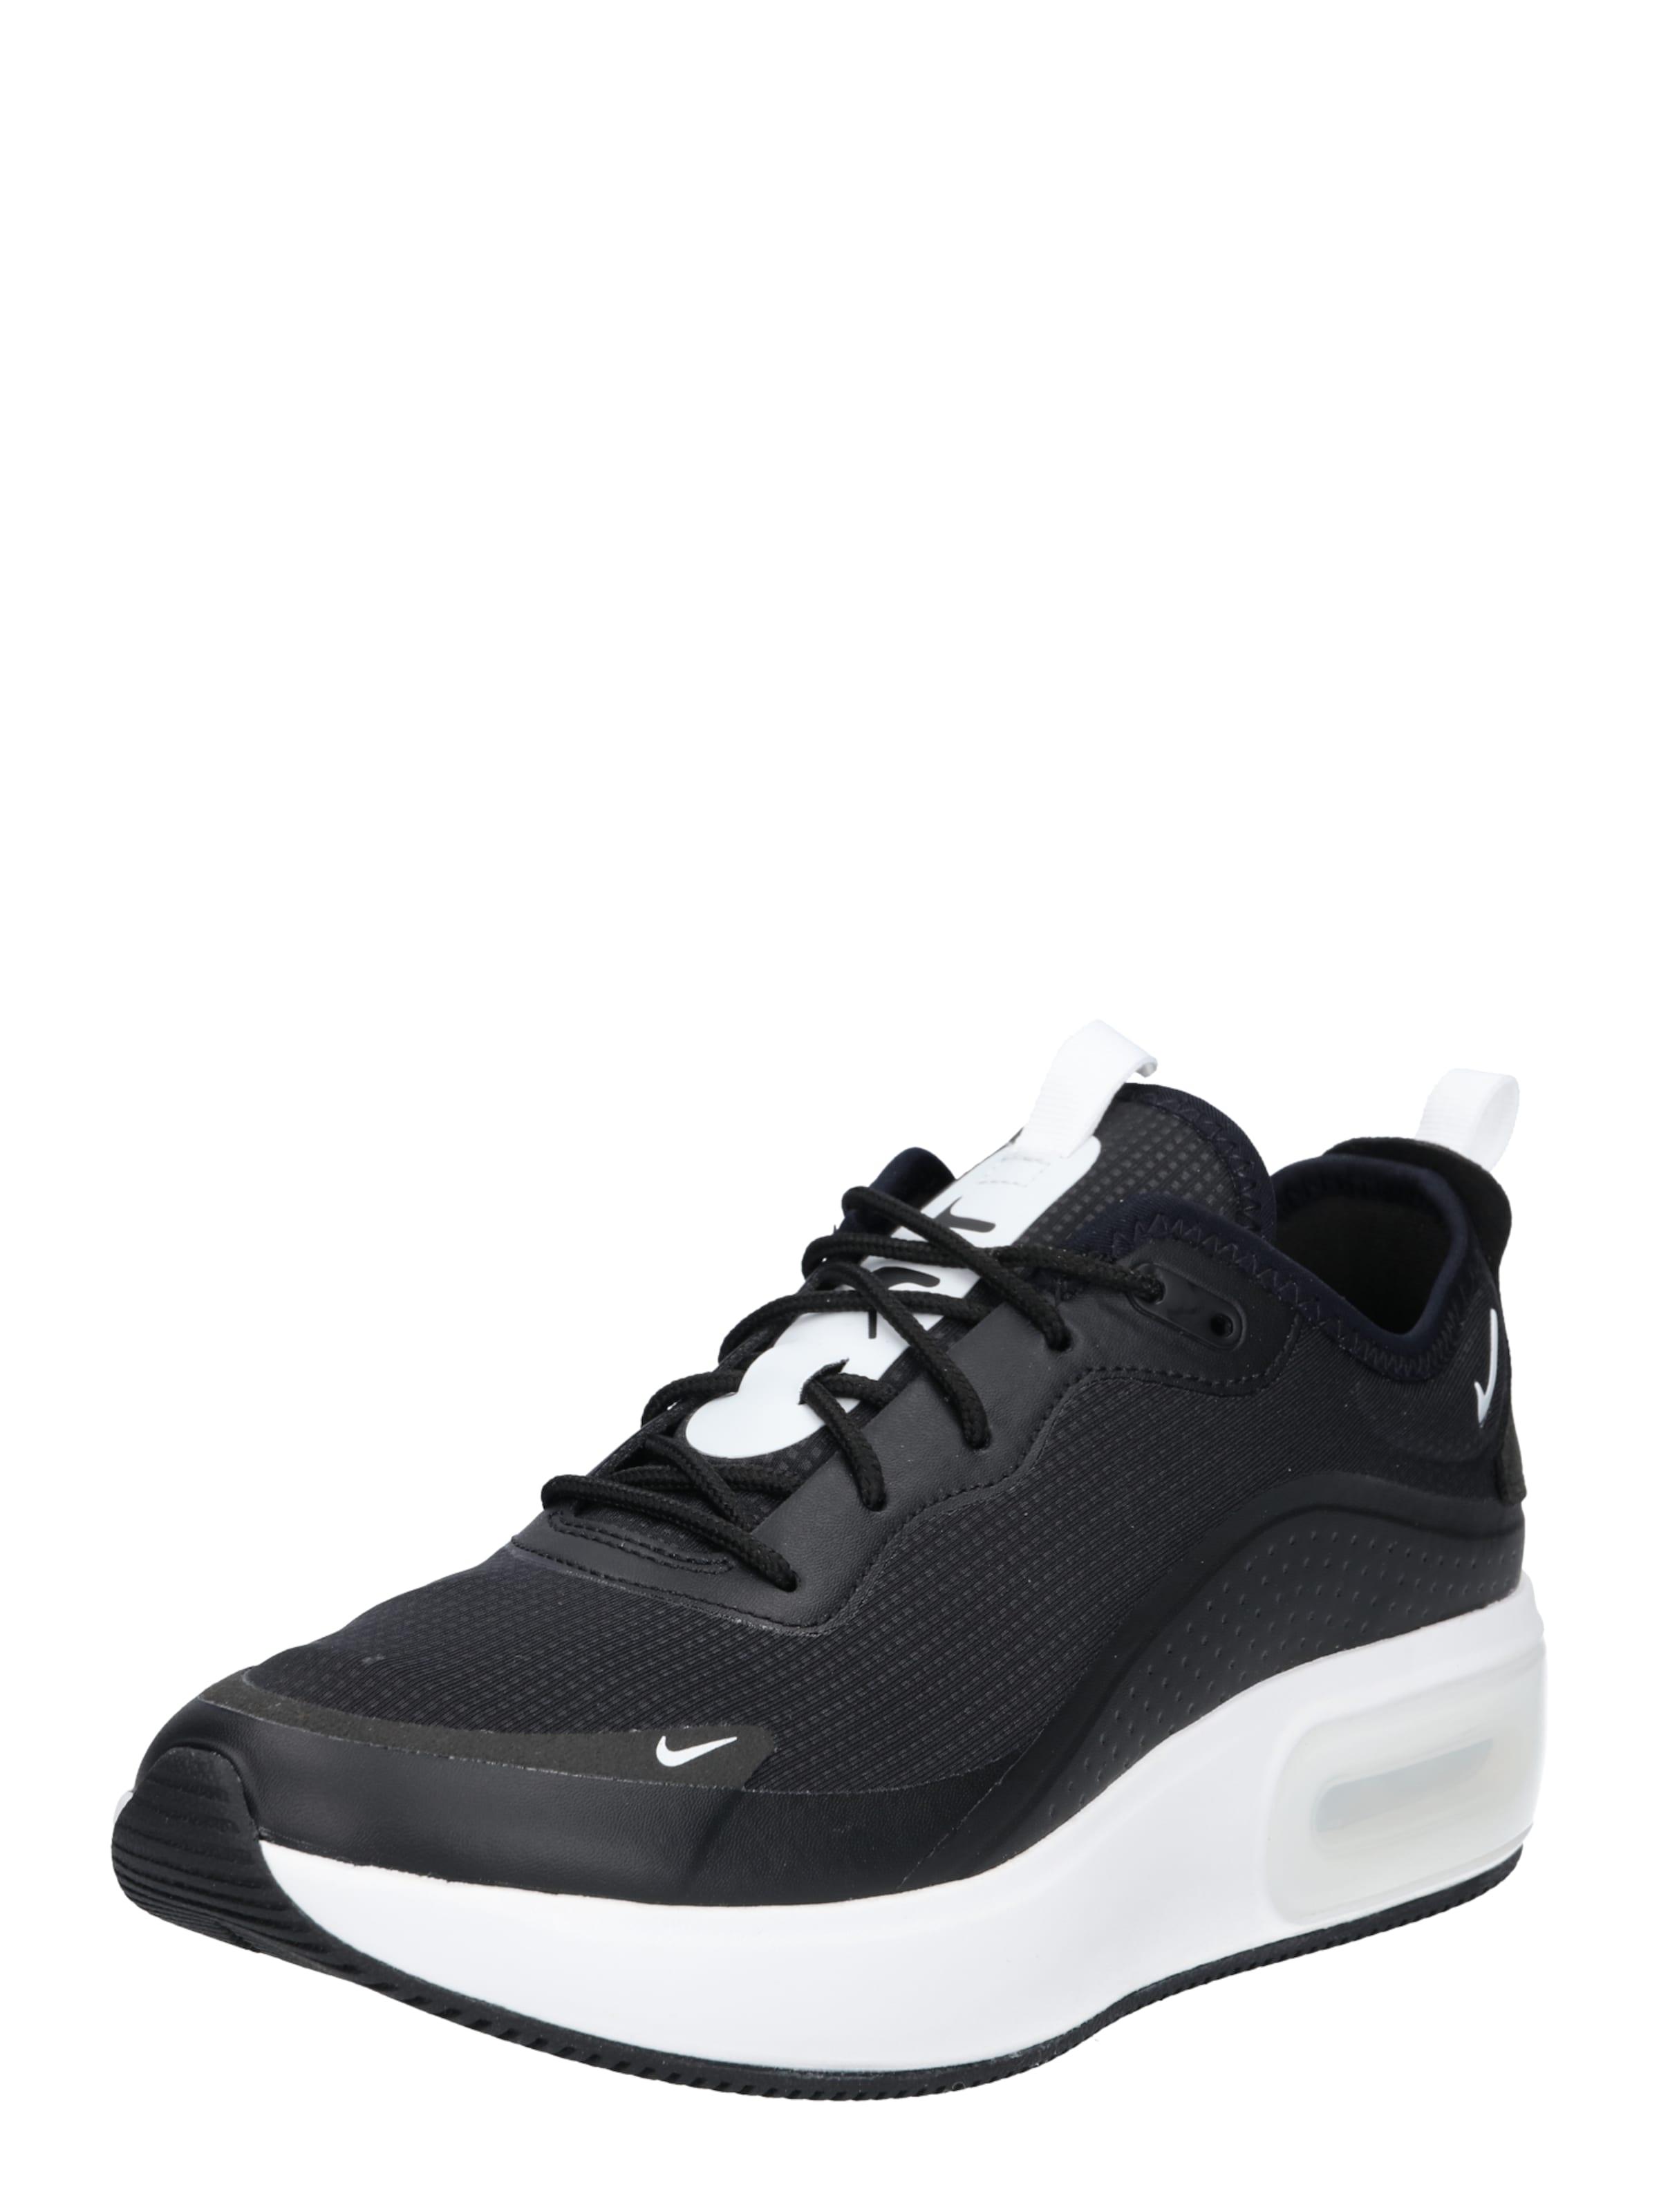 Max 'nike Dia' SchwarzWeiß Sneaker In Nike Air Sportswear 5cAq3RL4j